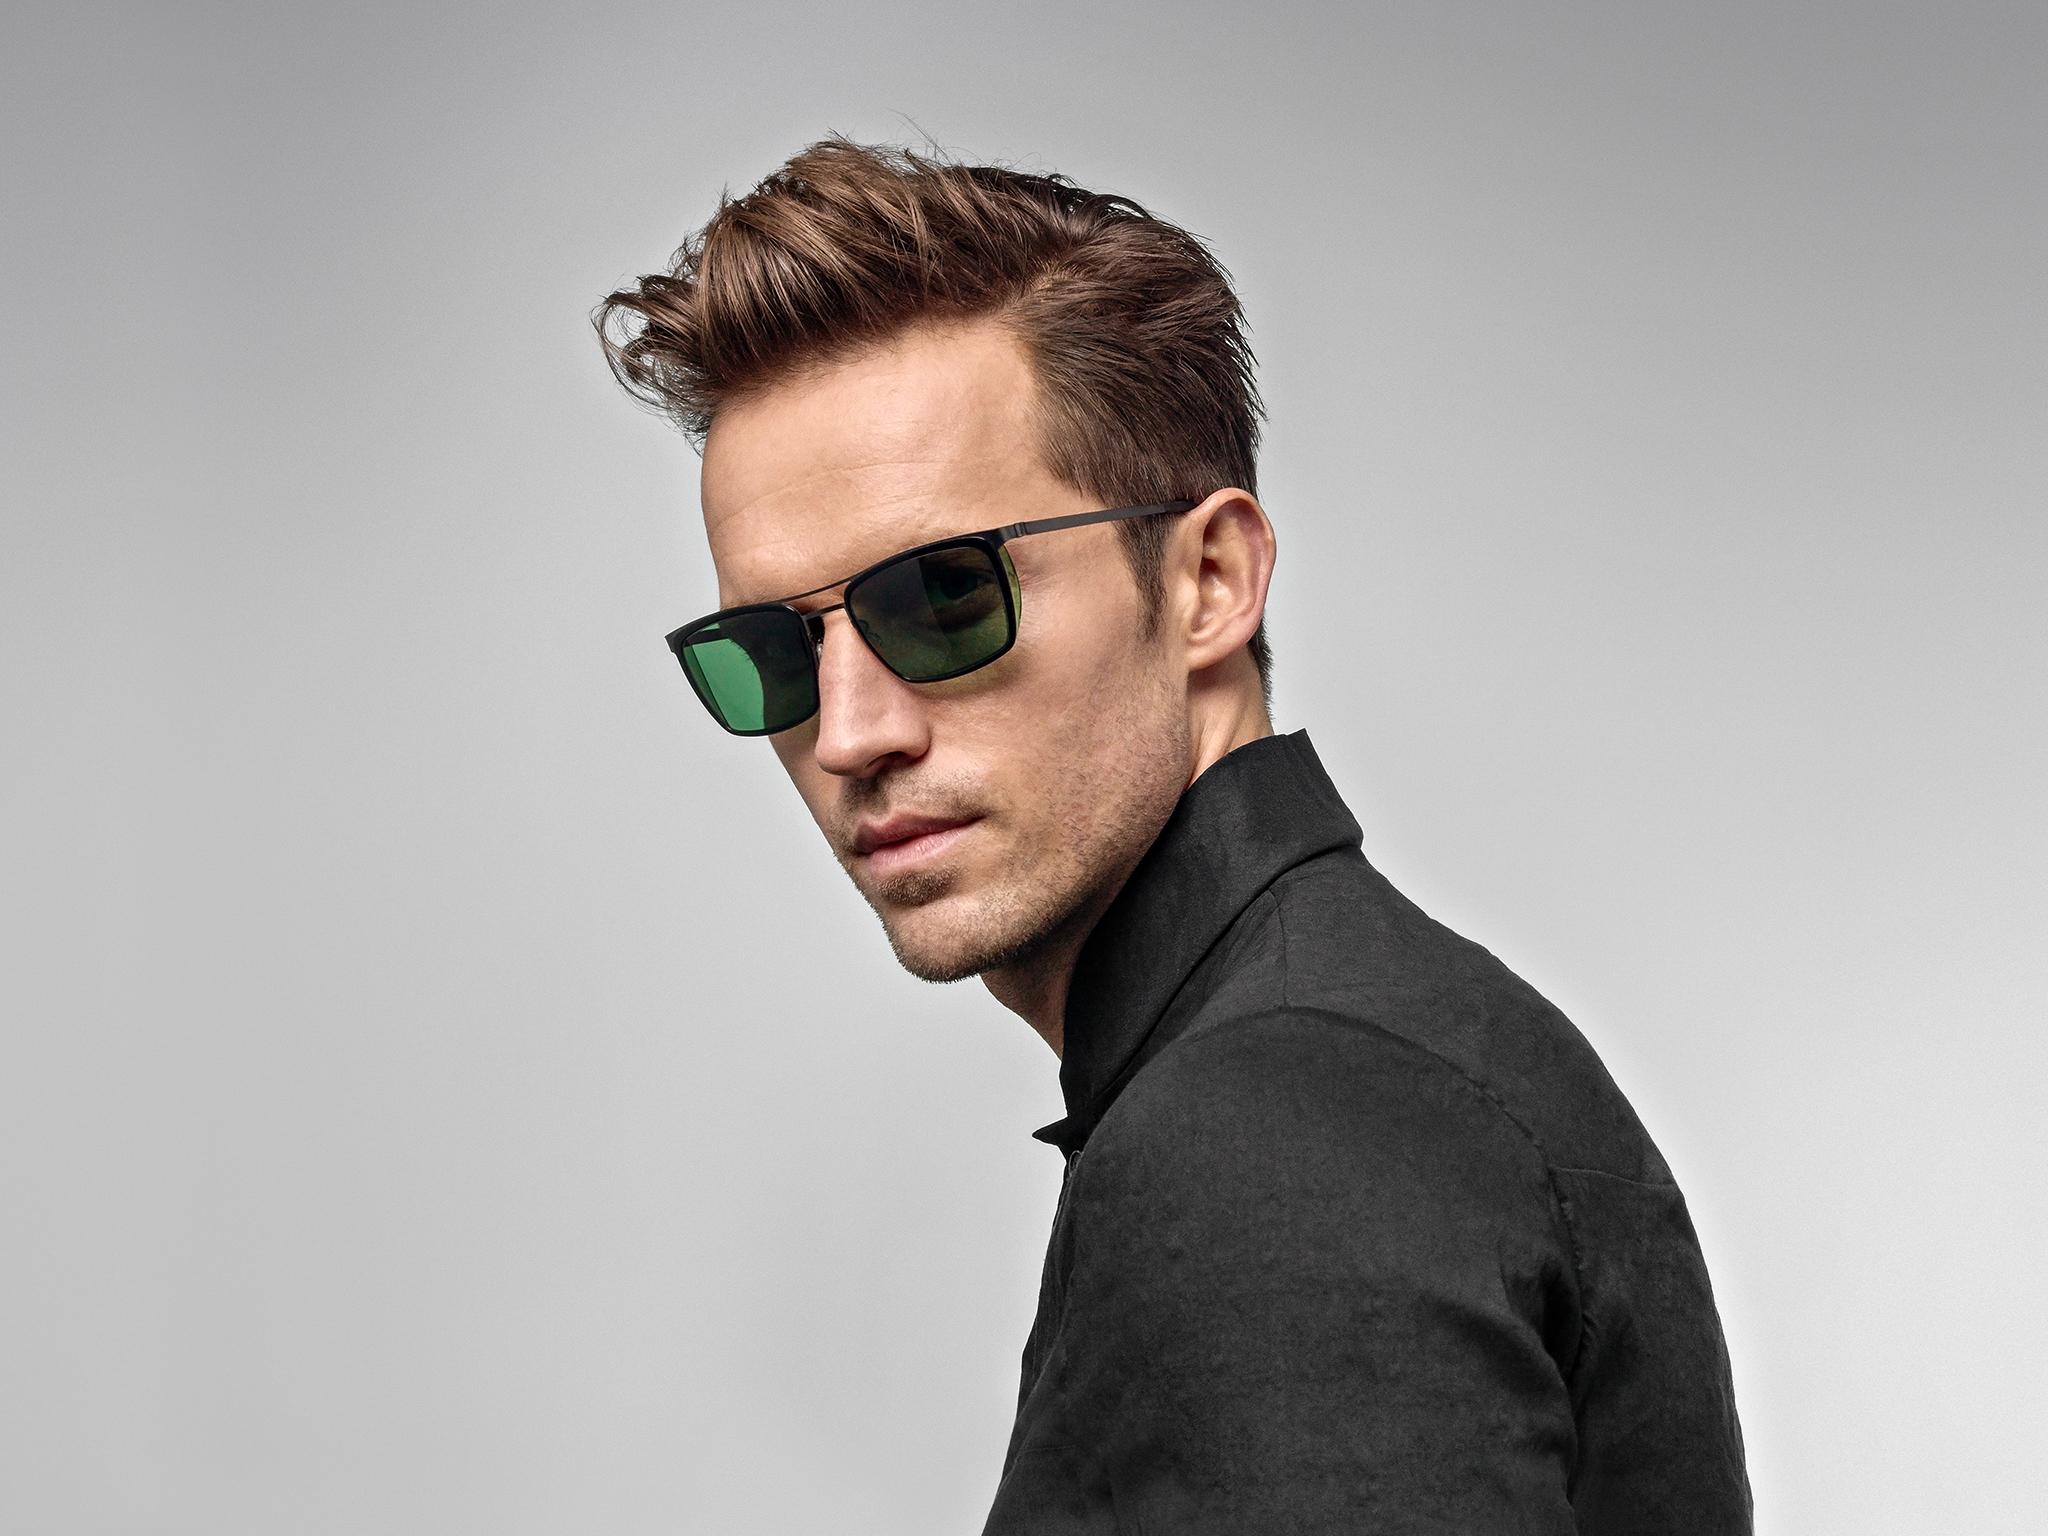 98f0d0d2b219 LINDBERG eyewear - lindberg.com